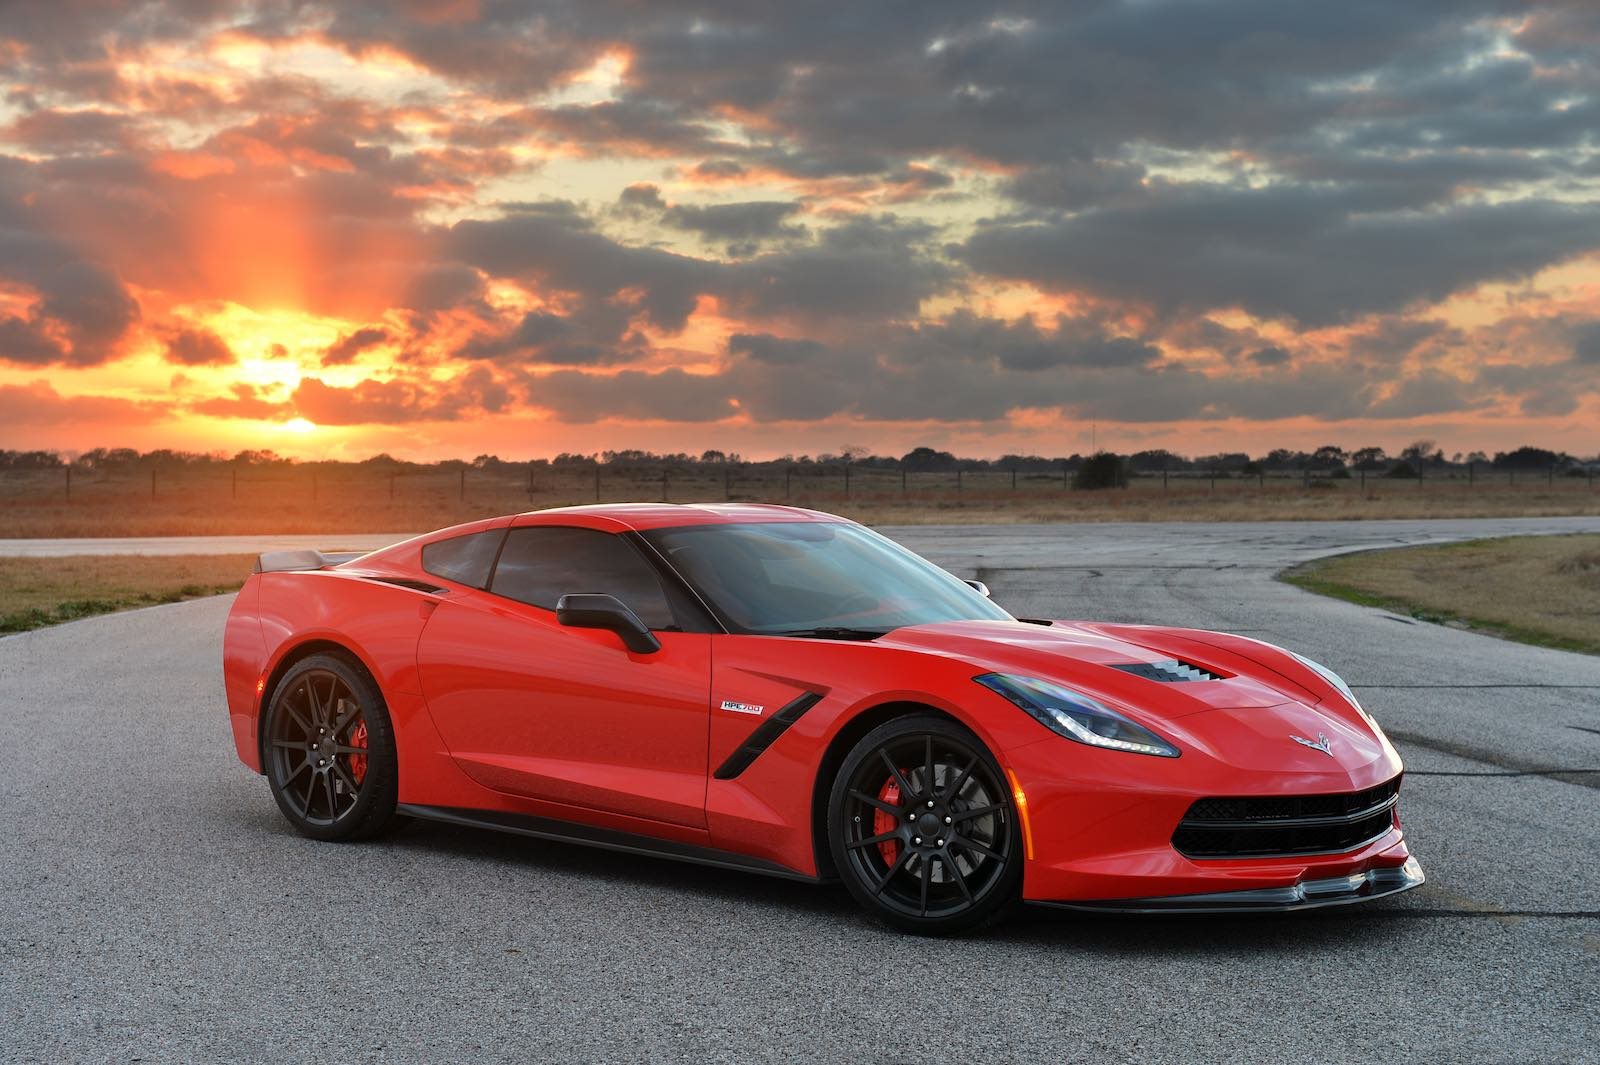 Hennessey_HPE700_TwinTurbo_Corvette_Stin